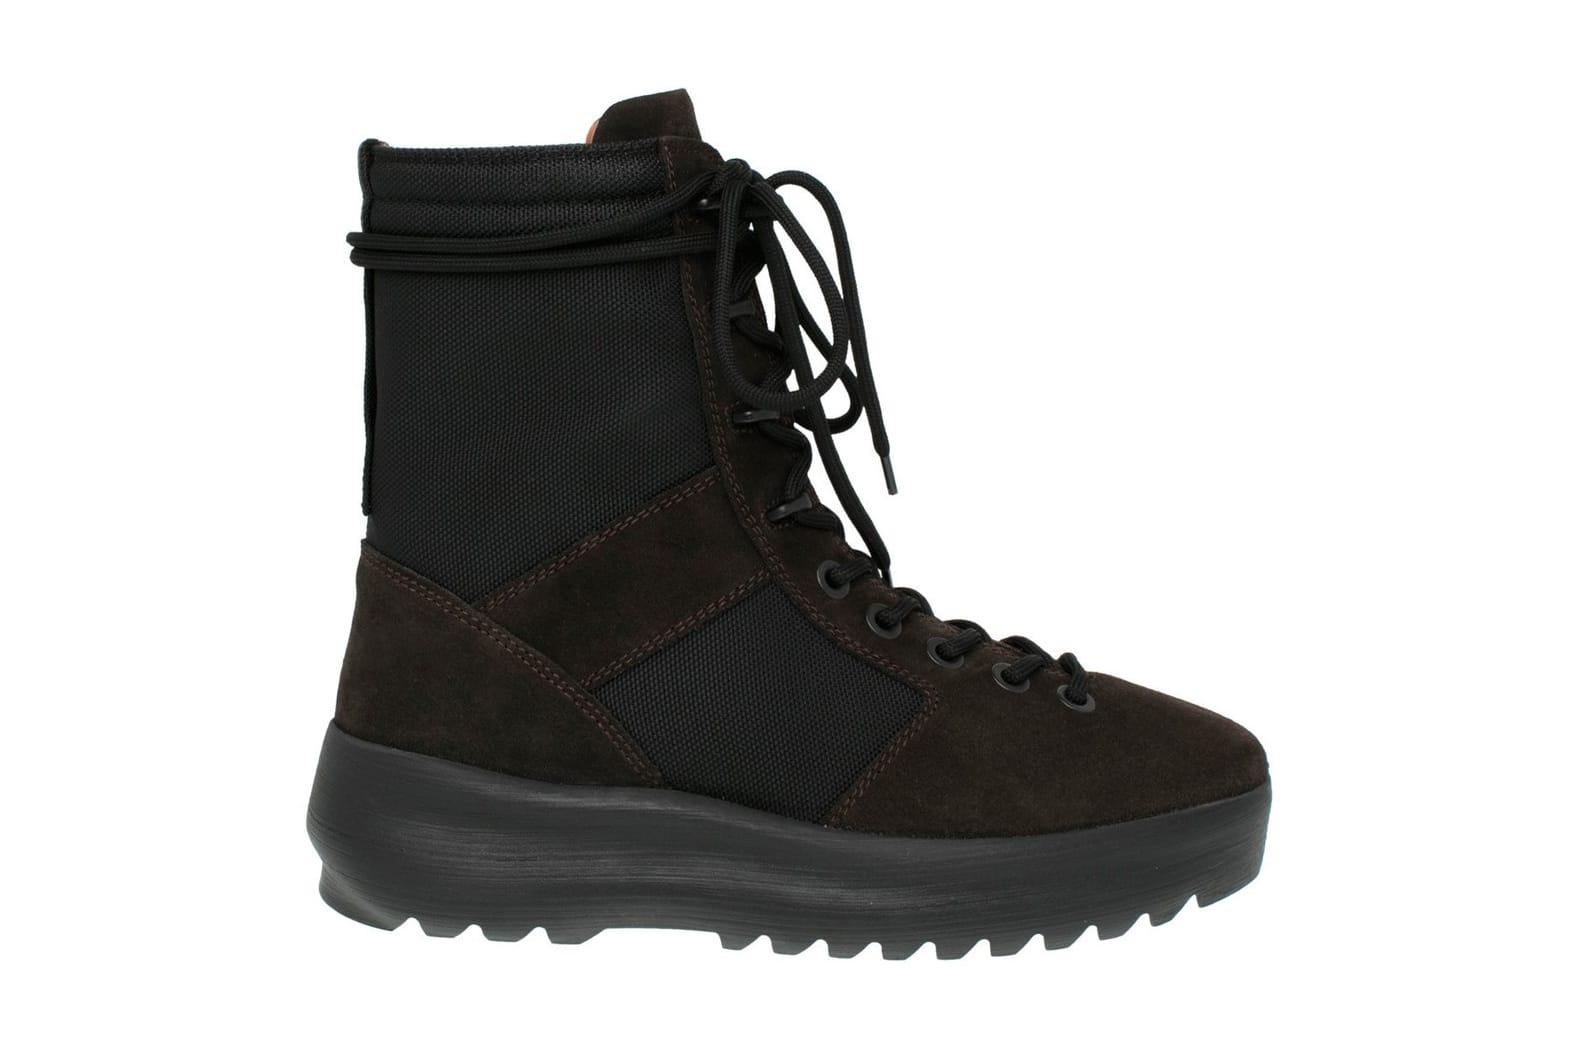 YEEZY Season 3 Military Boot in \